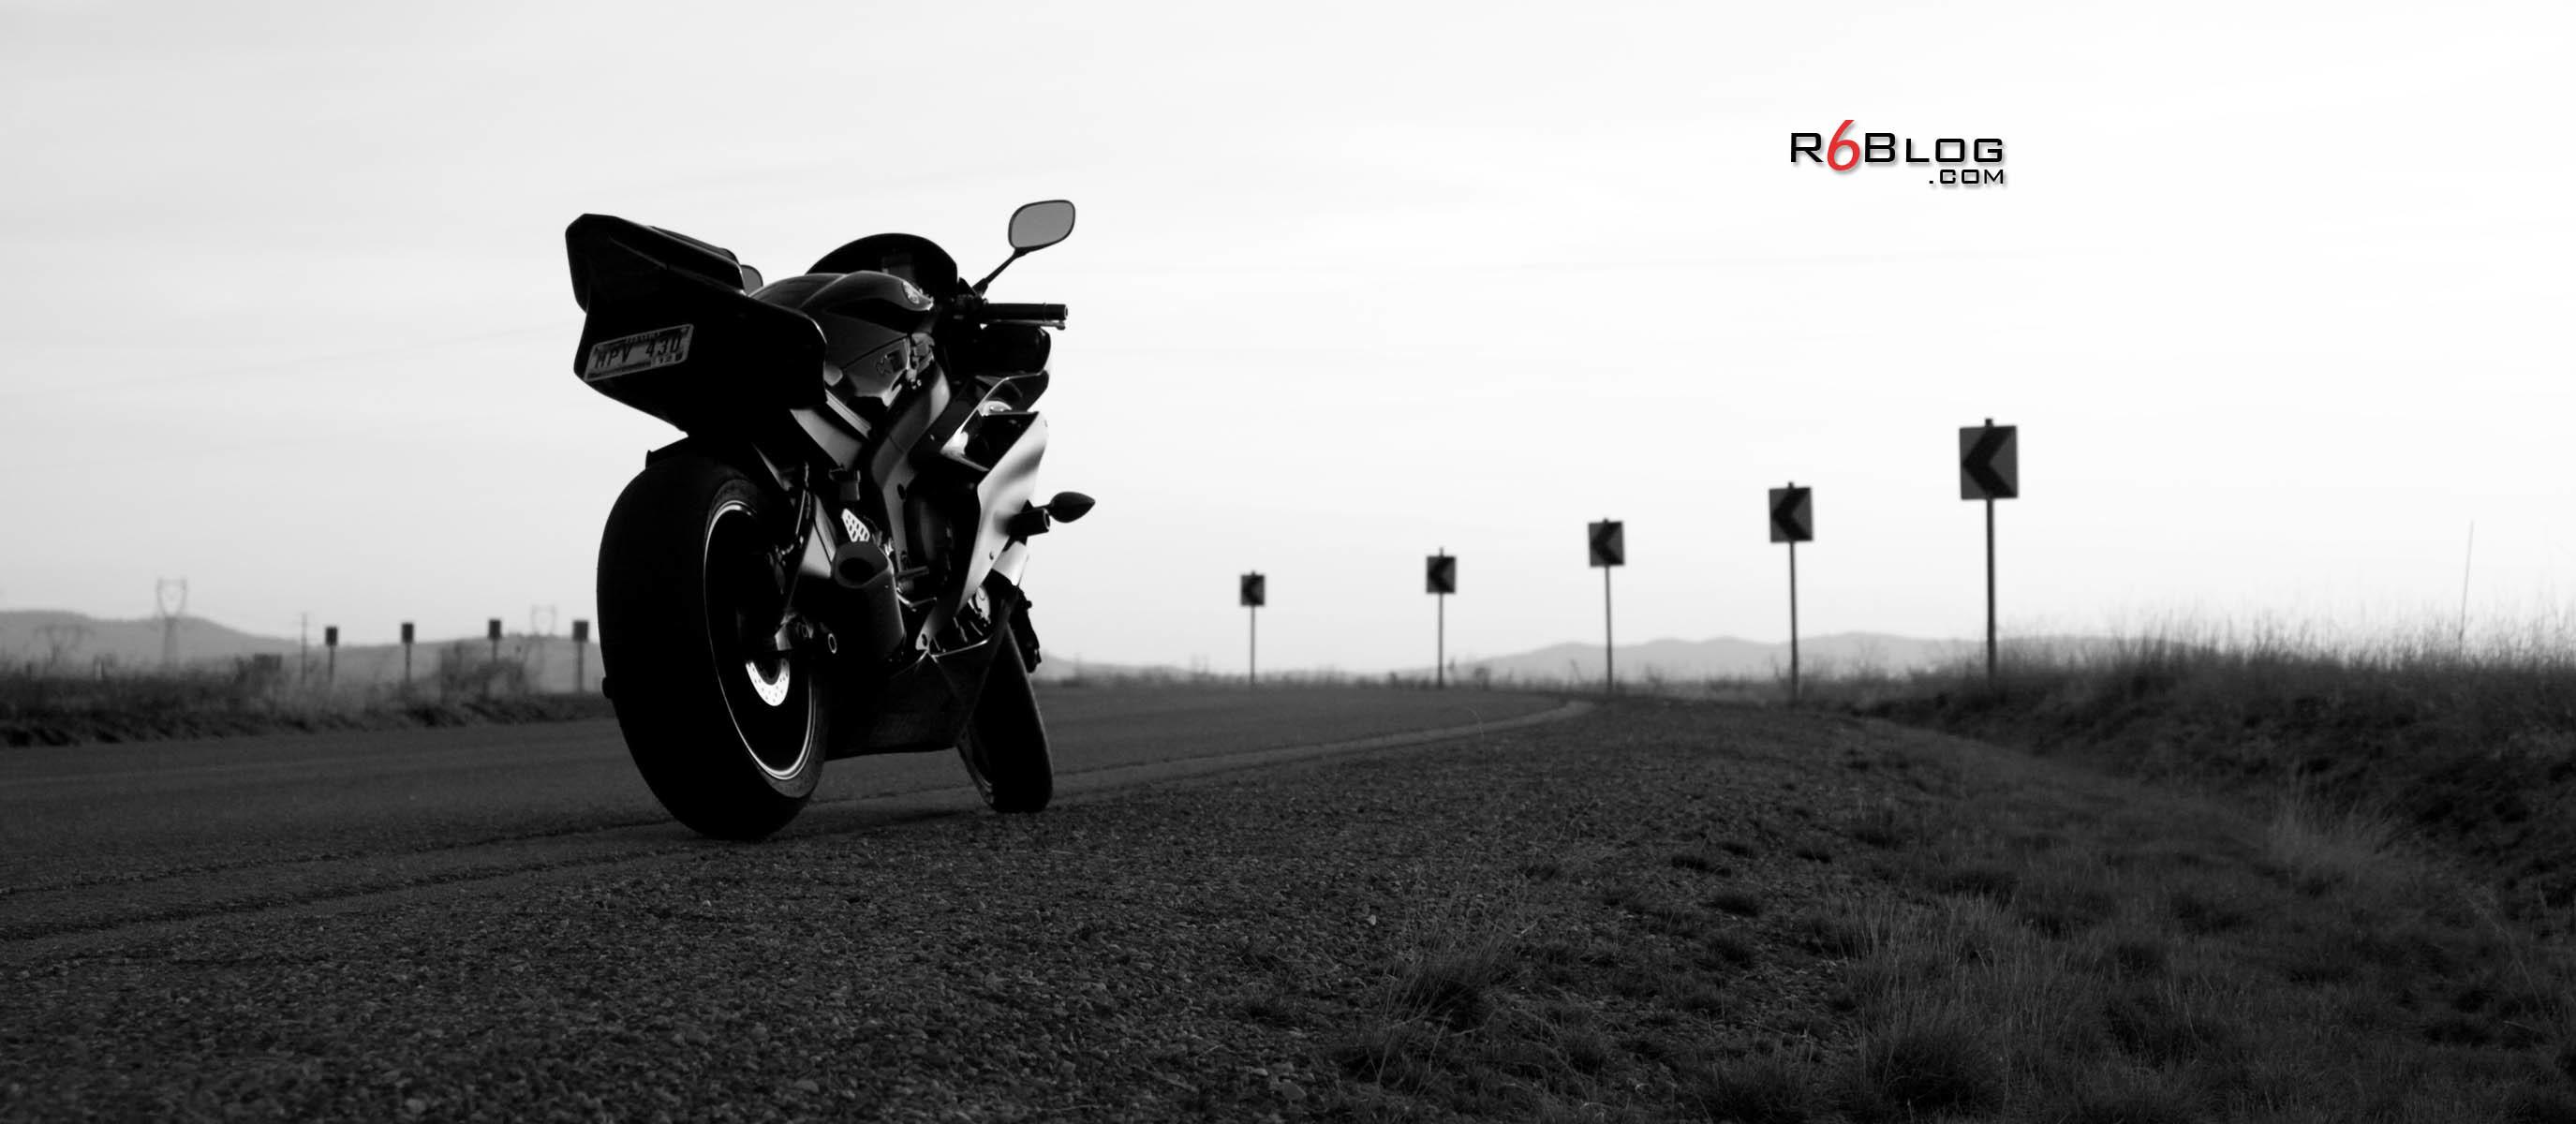 New Yamaha R6 Wallpapers From R6Blog.com! | R6Blog | The Yamaha R6 .